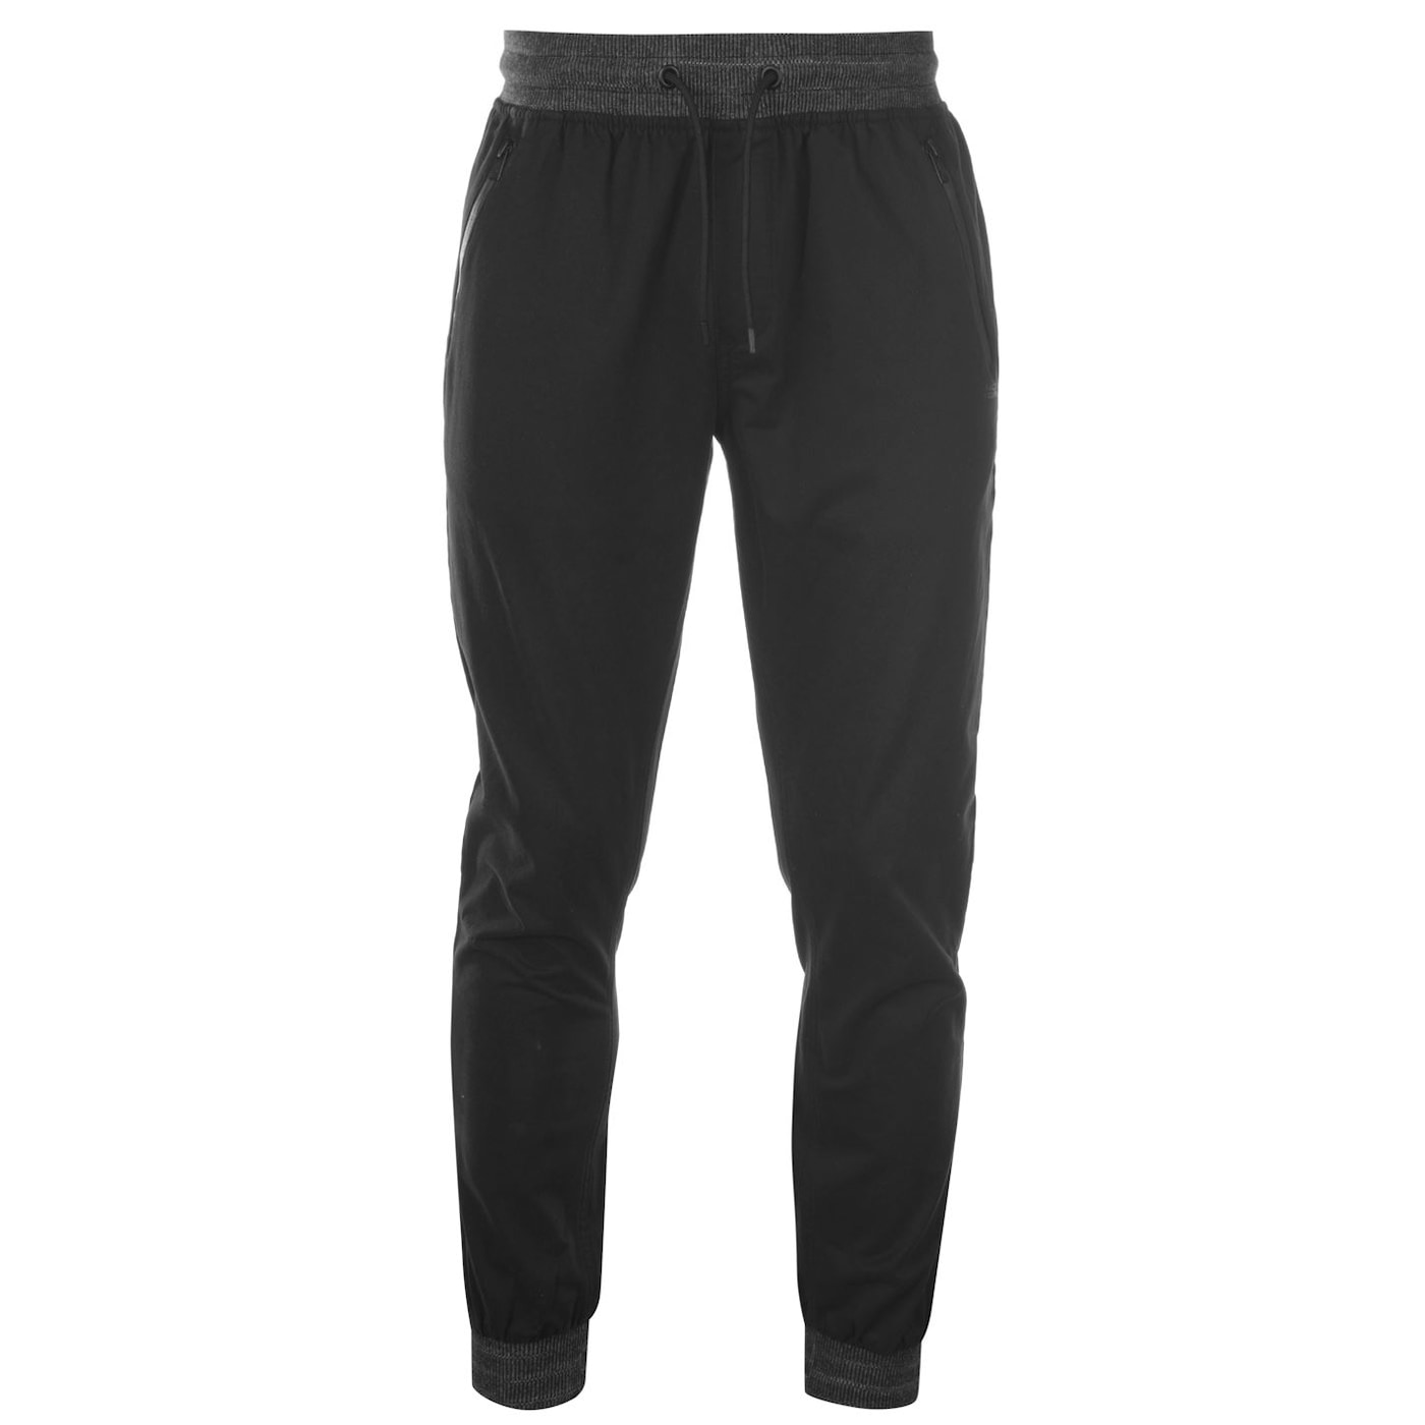 Men's pants No Fear Chino